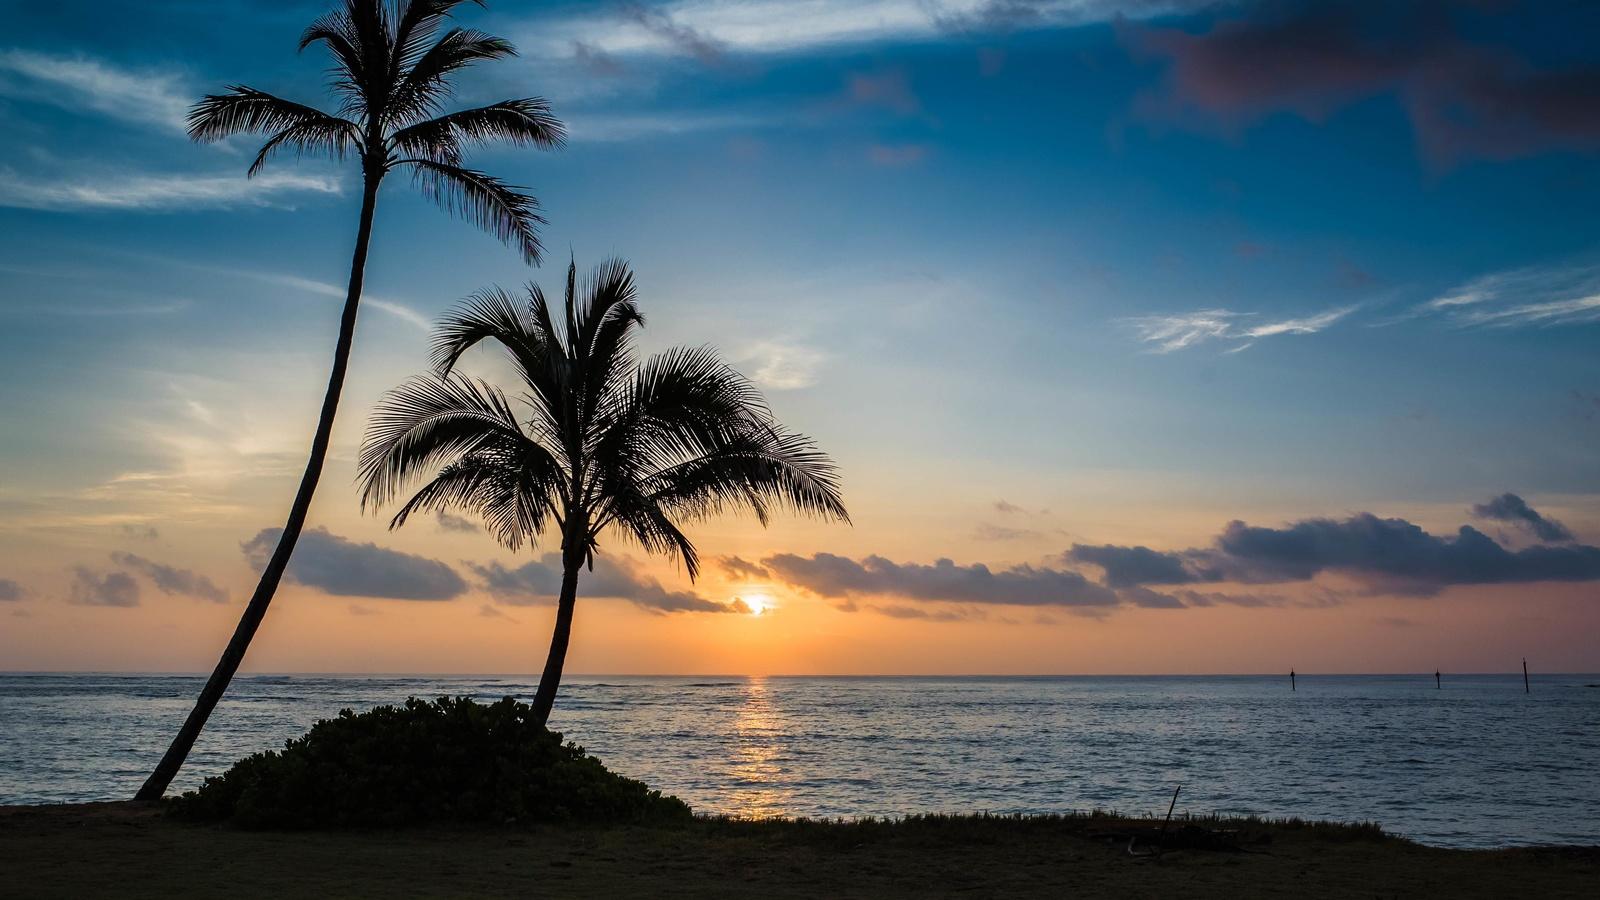 пальма, пляж, закат, море